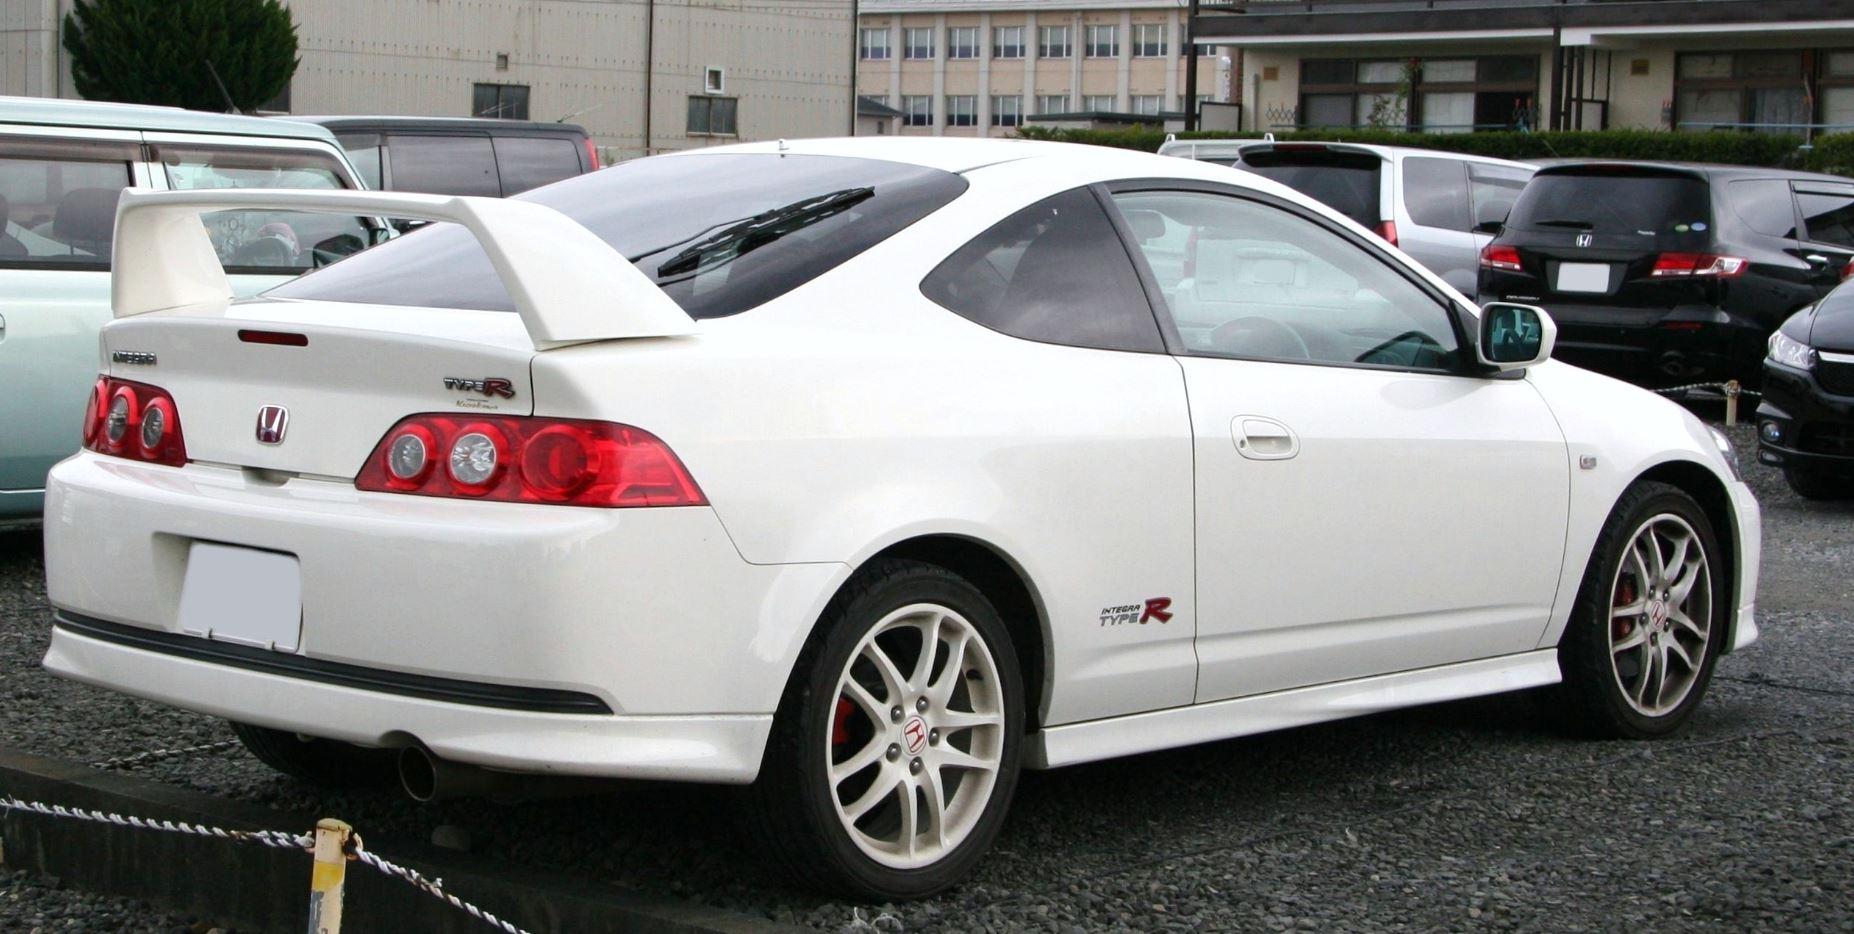 is the honda integra type r rear wheel drive garage dreams is the honda integra type r rear wheel drive garage dreams